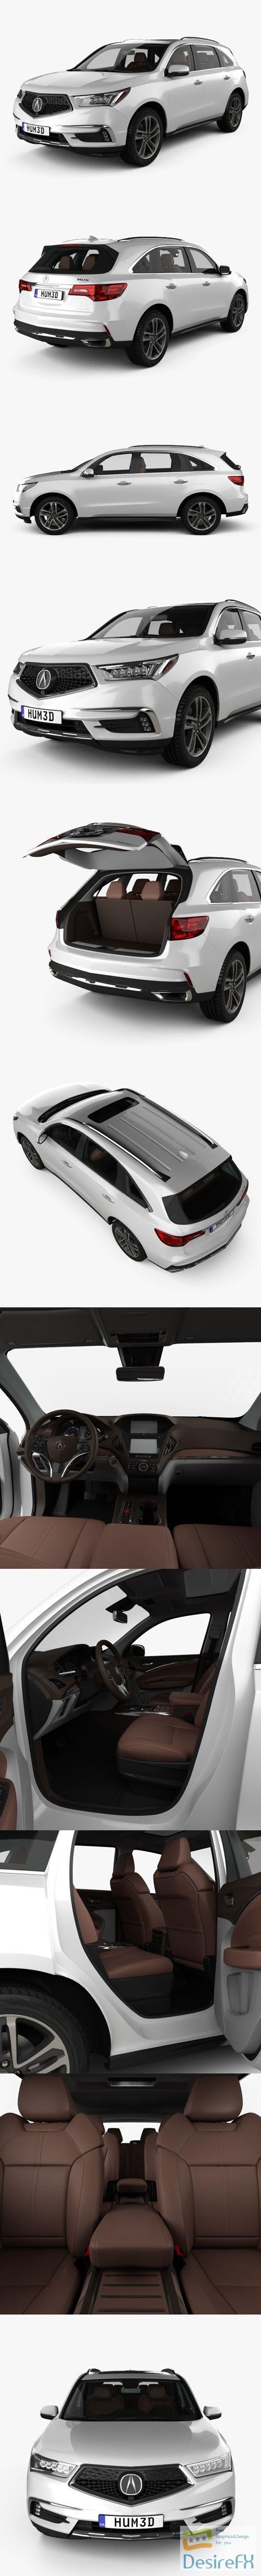 3d-models - Acura MDX Sport Hybrid HQ interior 2017 3D Model